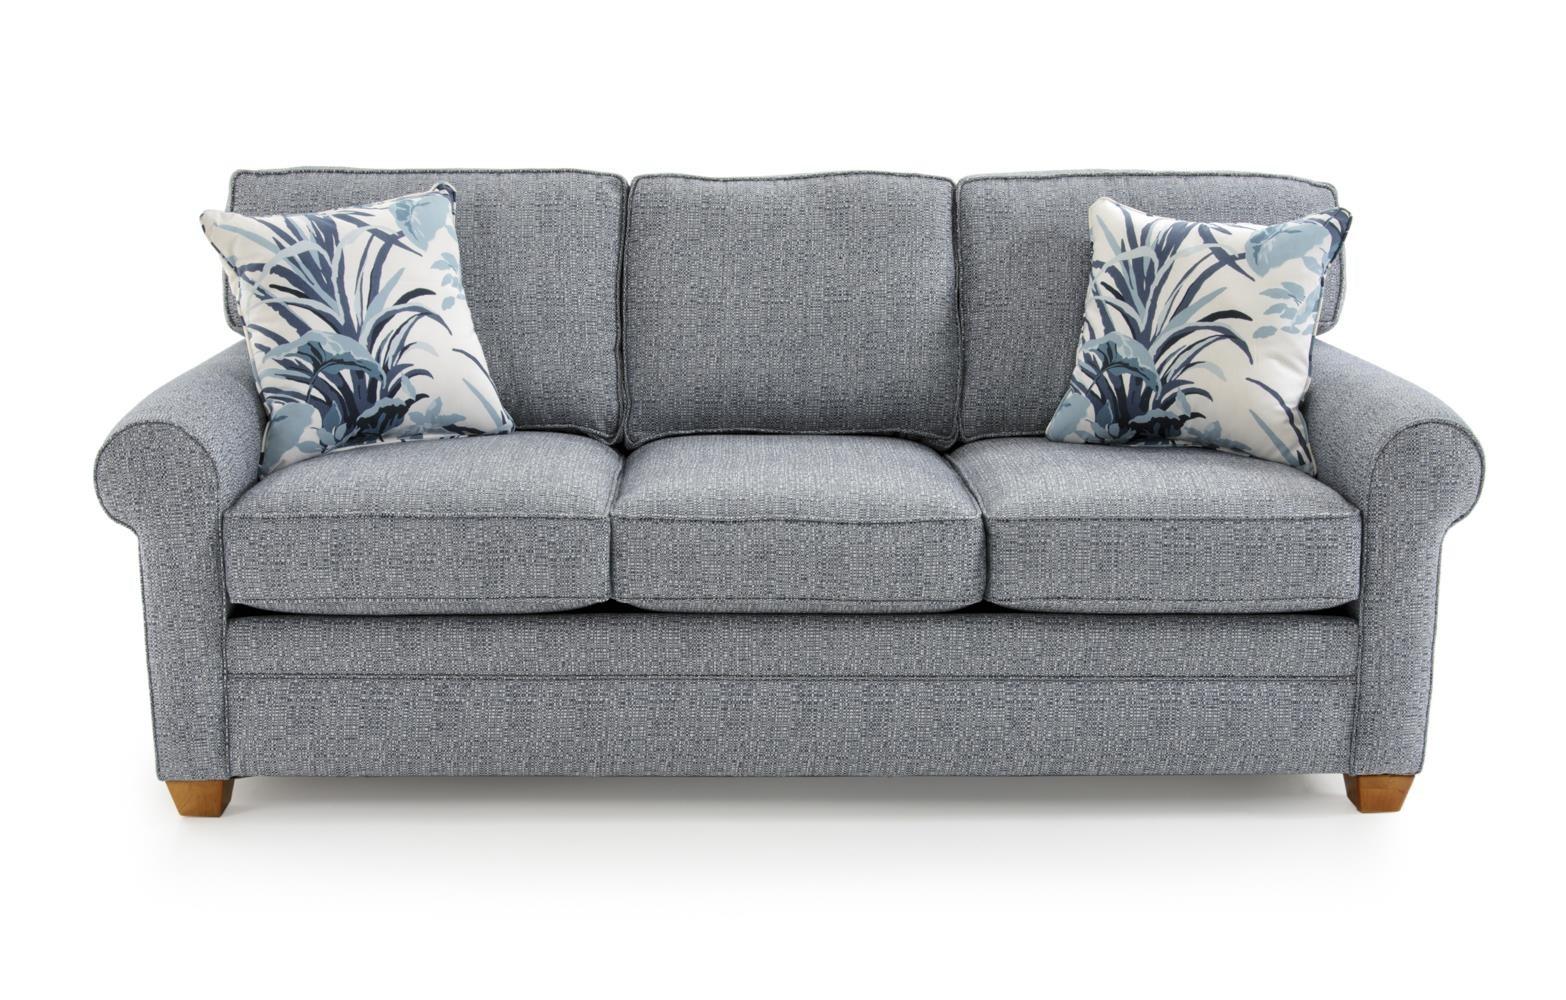 Capris Furniture 402 Sofa - Item Number: S402 ALLOX OCEAN